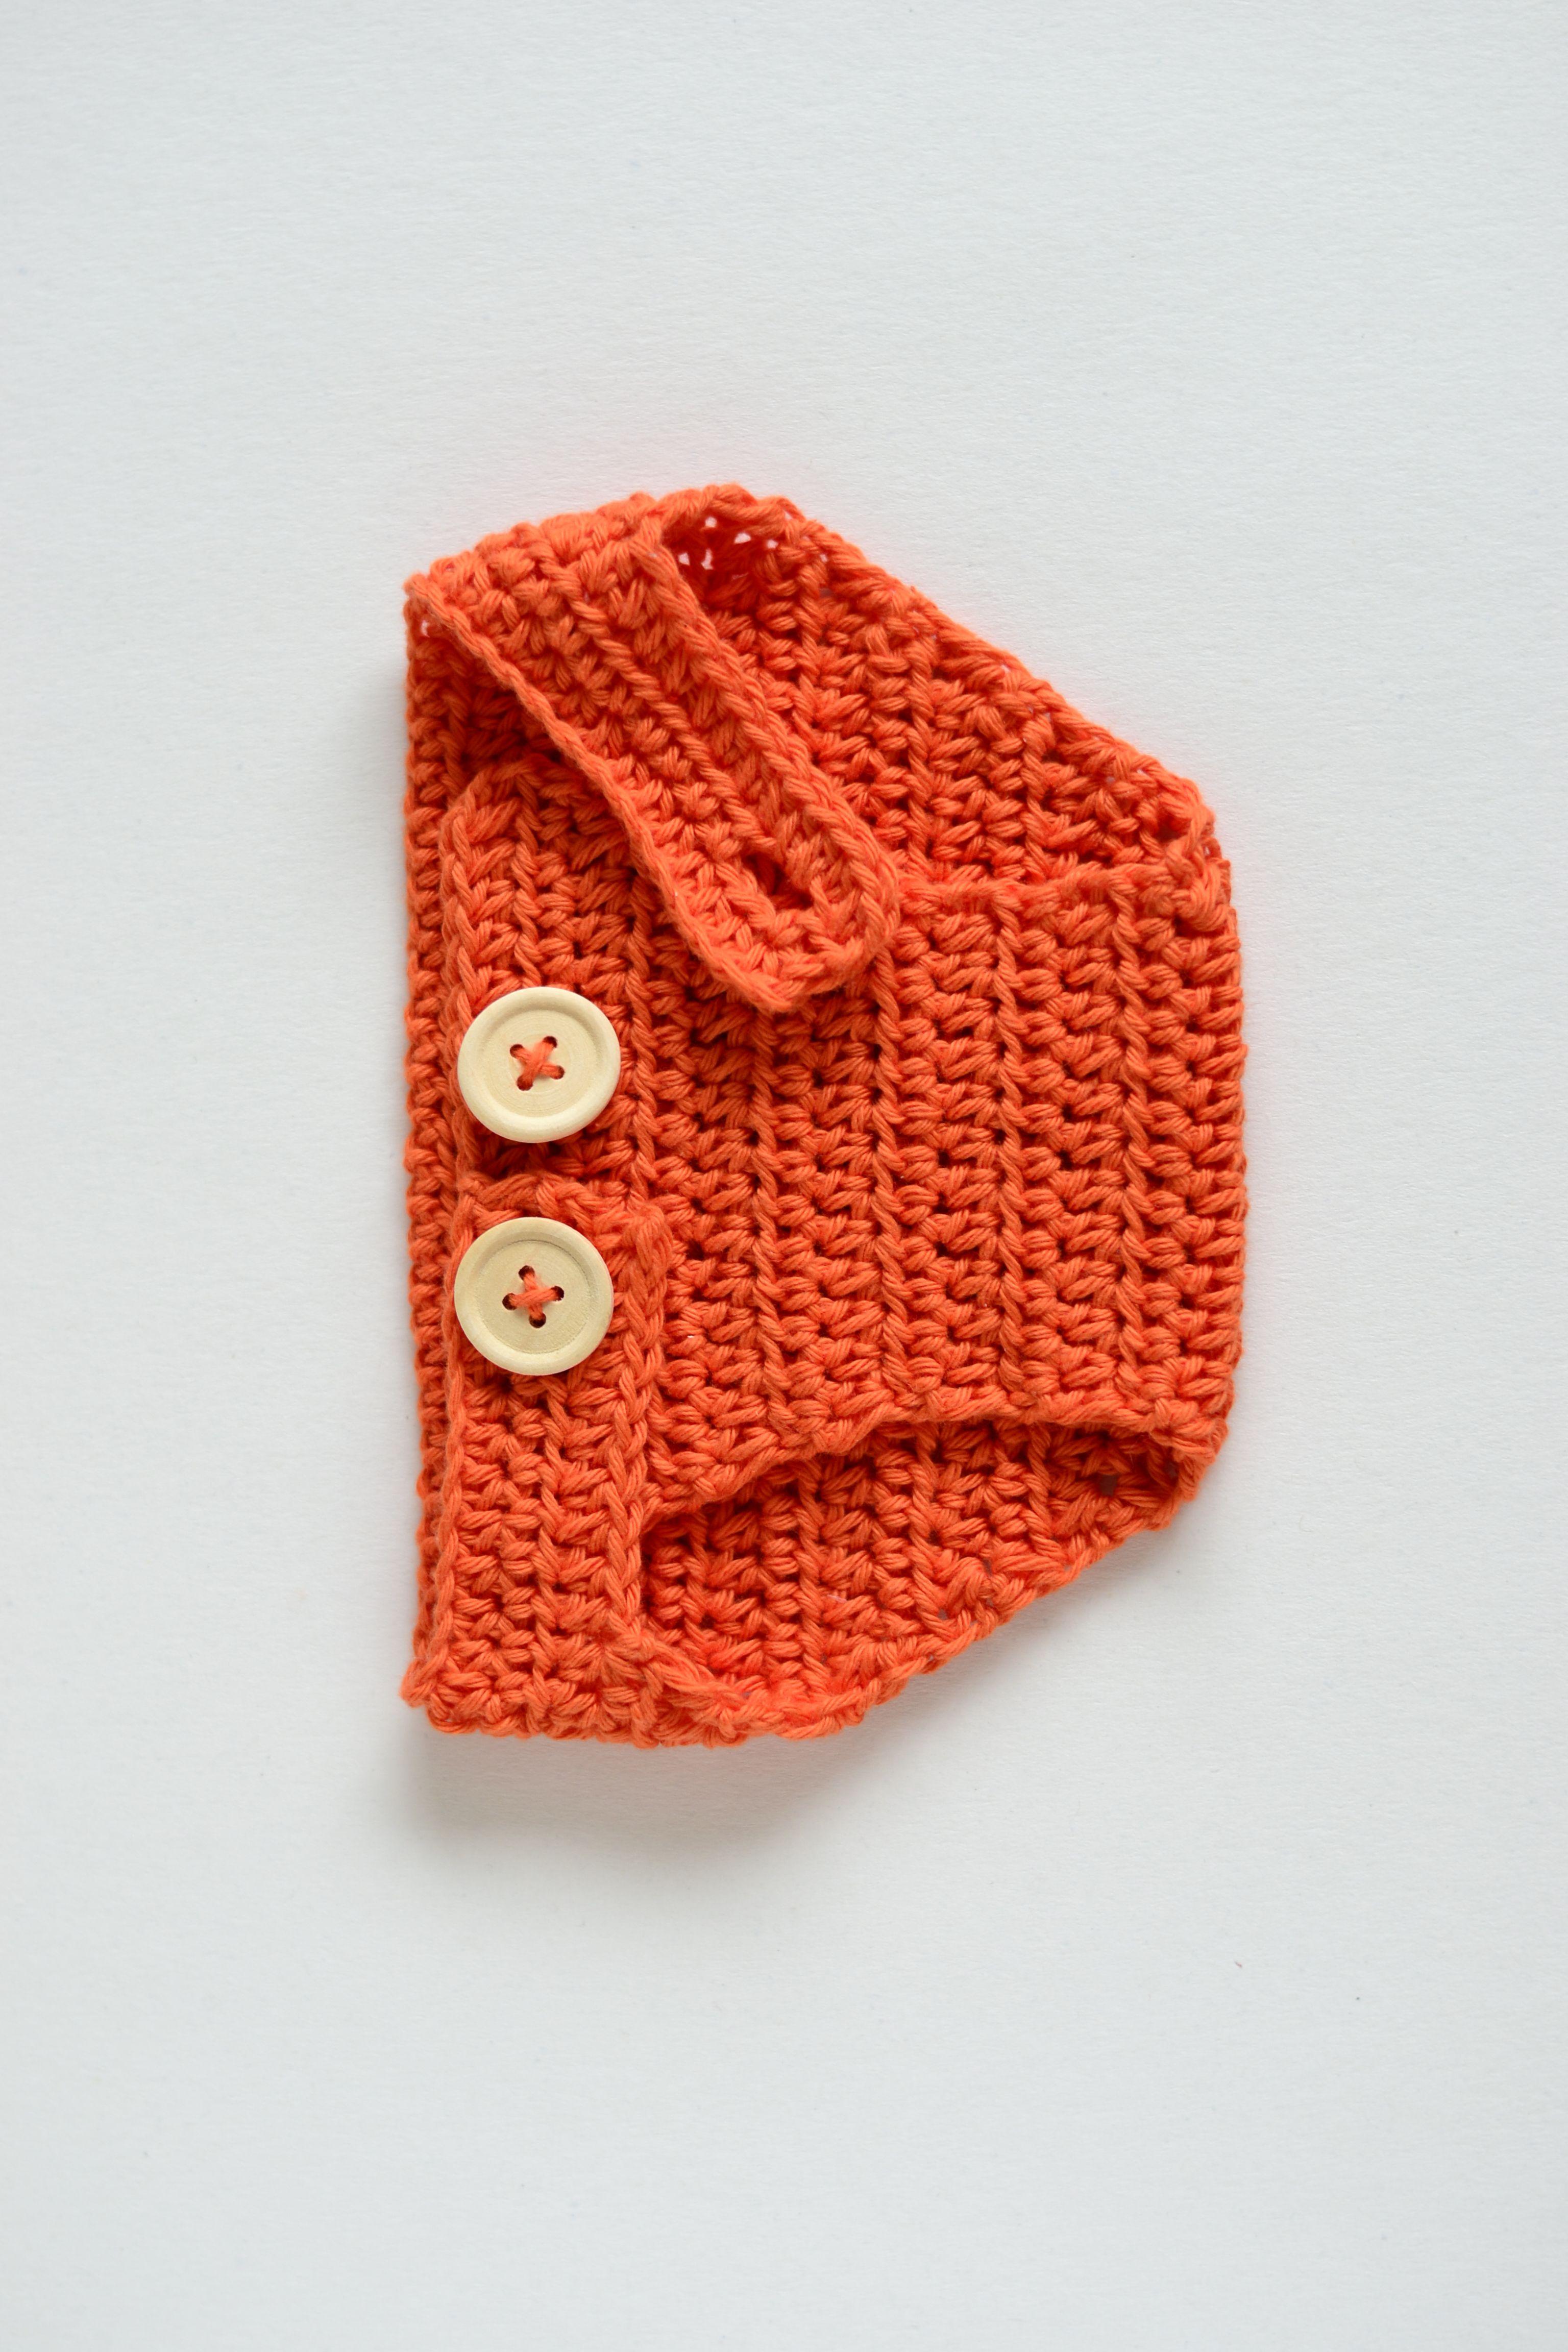 Croby Patterns - FREE Crochet Pattern - Cute Fox   Craft   Pinterest ...